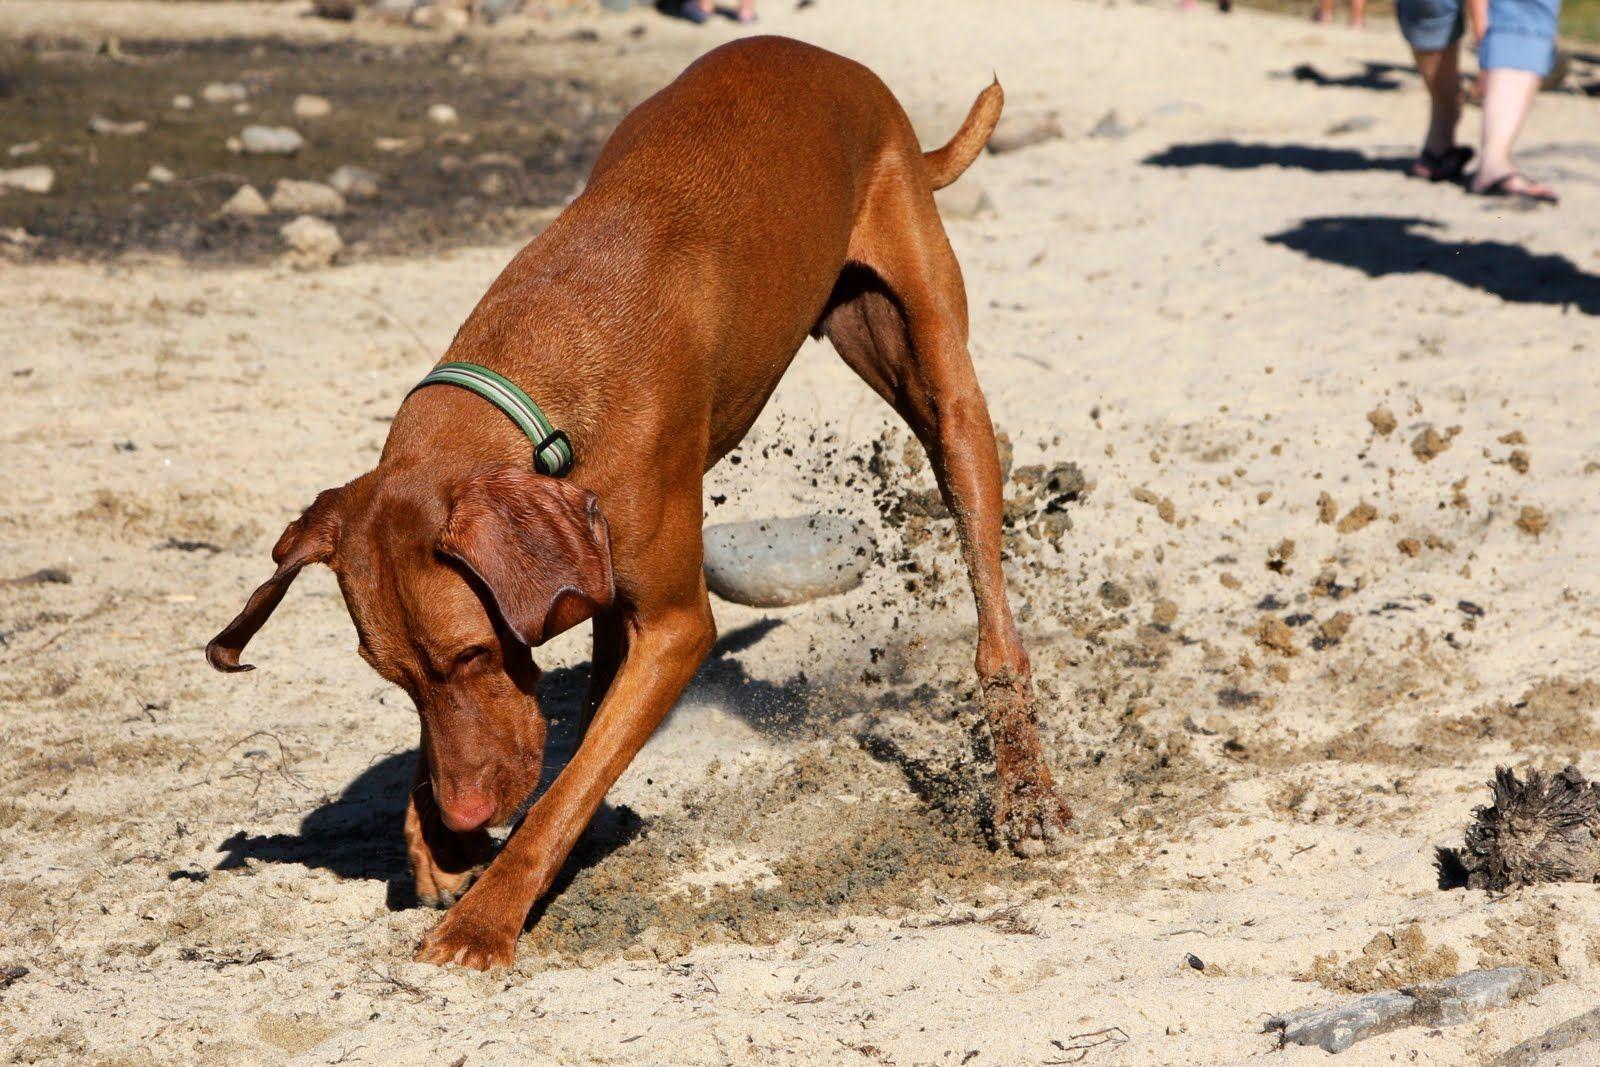 vizsla digging